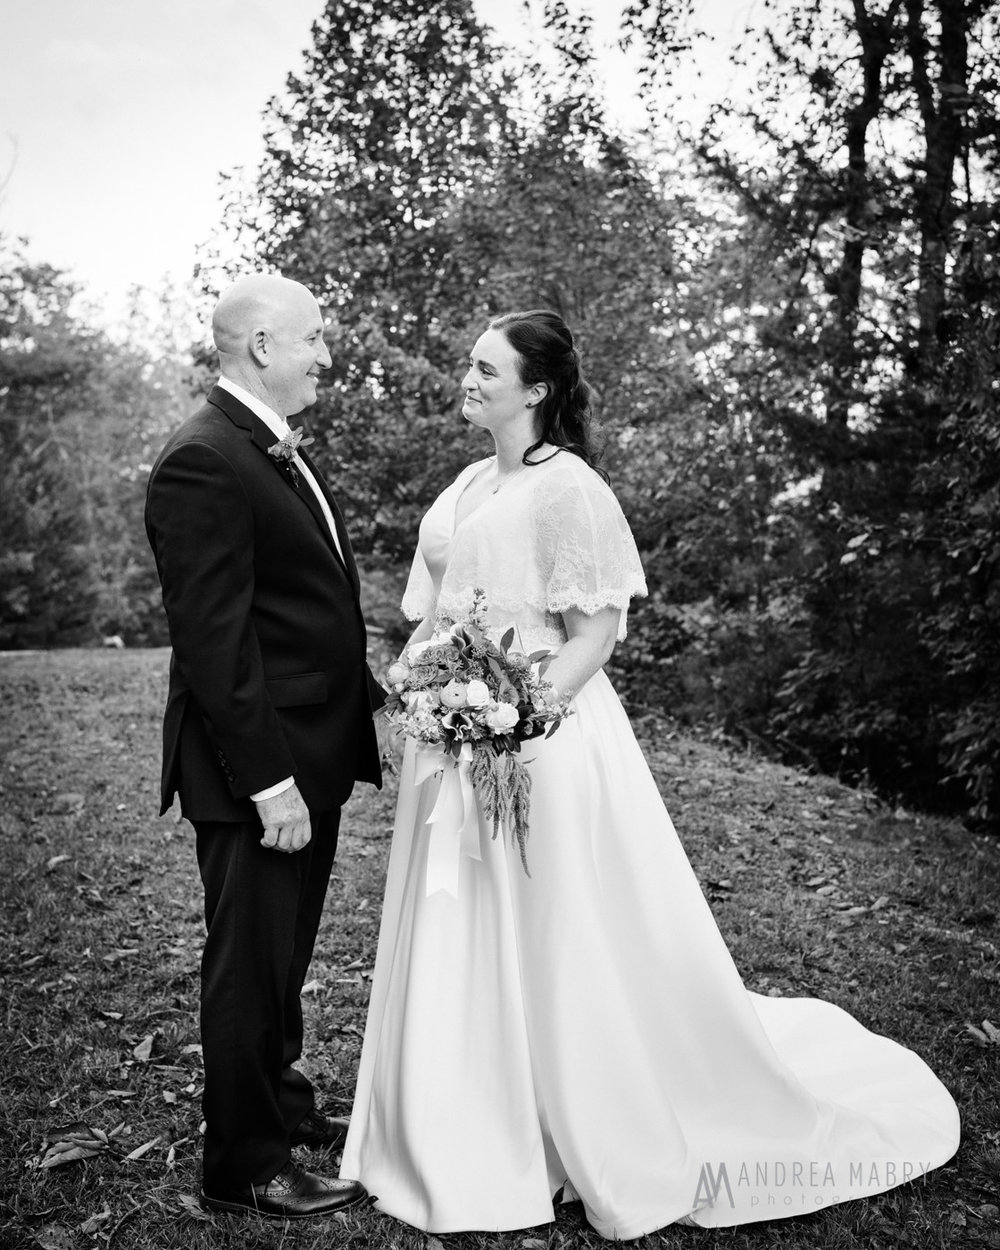 scott-wed-blog-mabry-051-8805-2.jpg